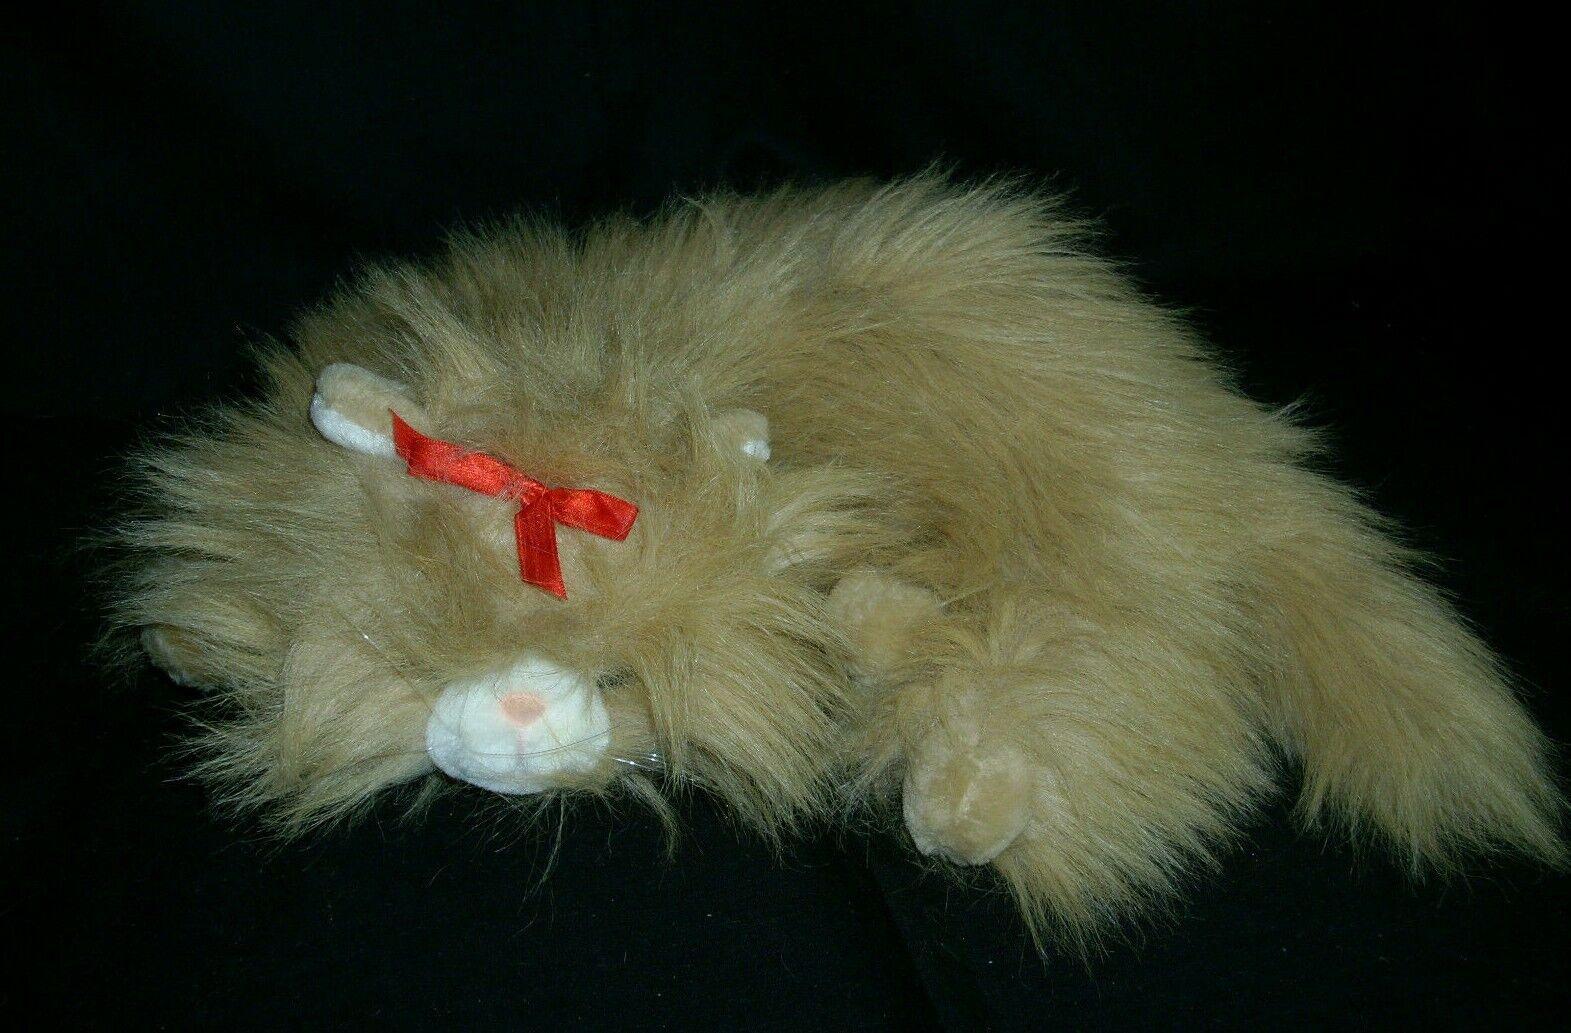 VINTAGE COMMONWEALTH 1991 KIT'N MEOWING KITTIES STUFFED ANIMAL PLUSH CAT SOUND